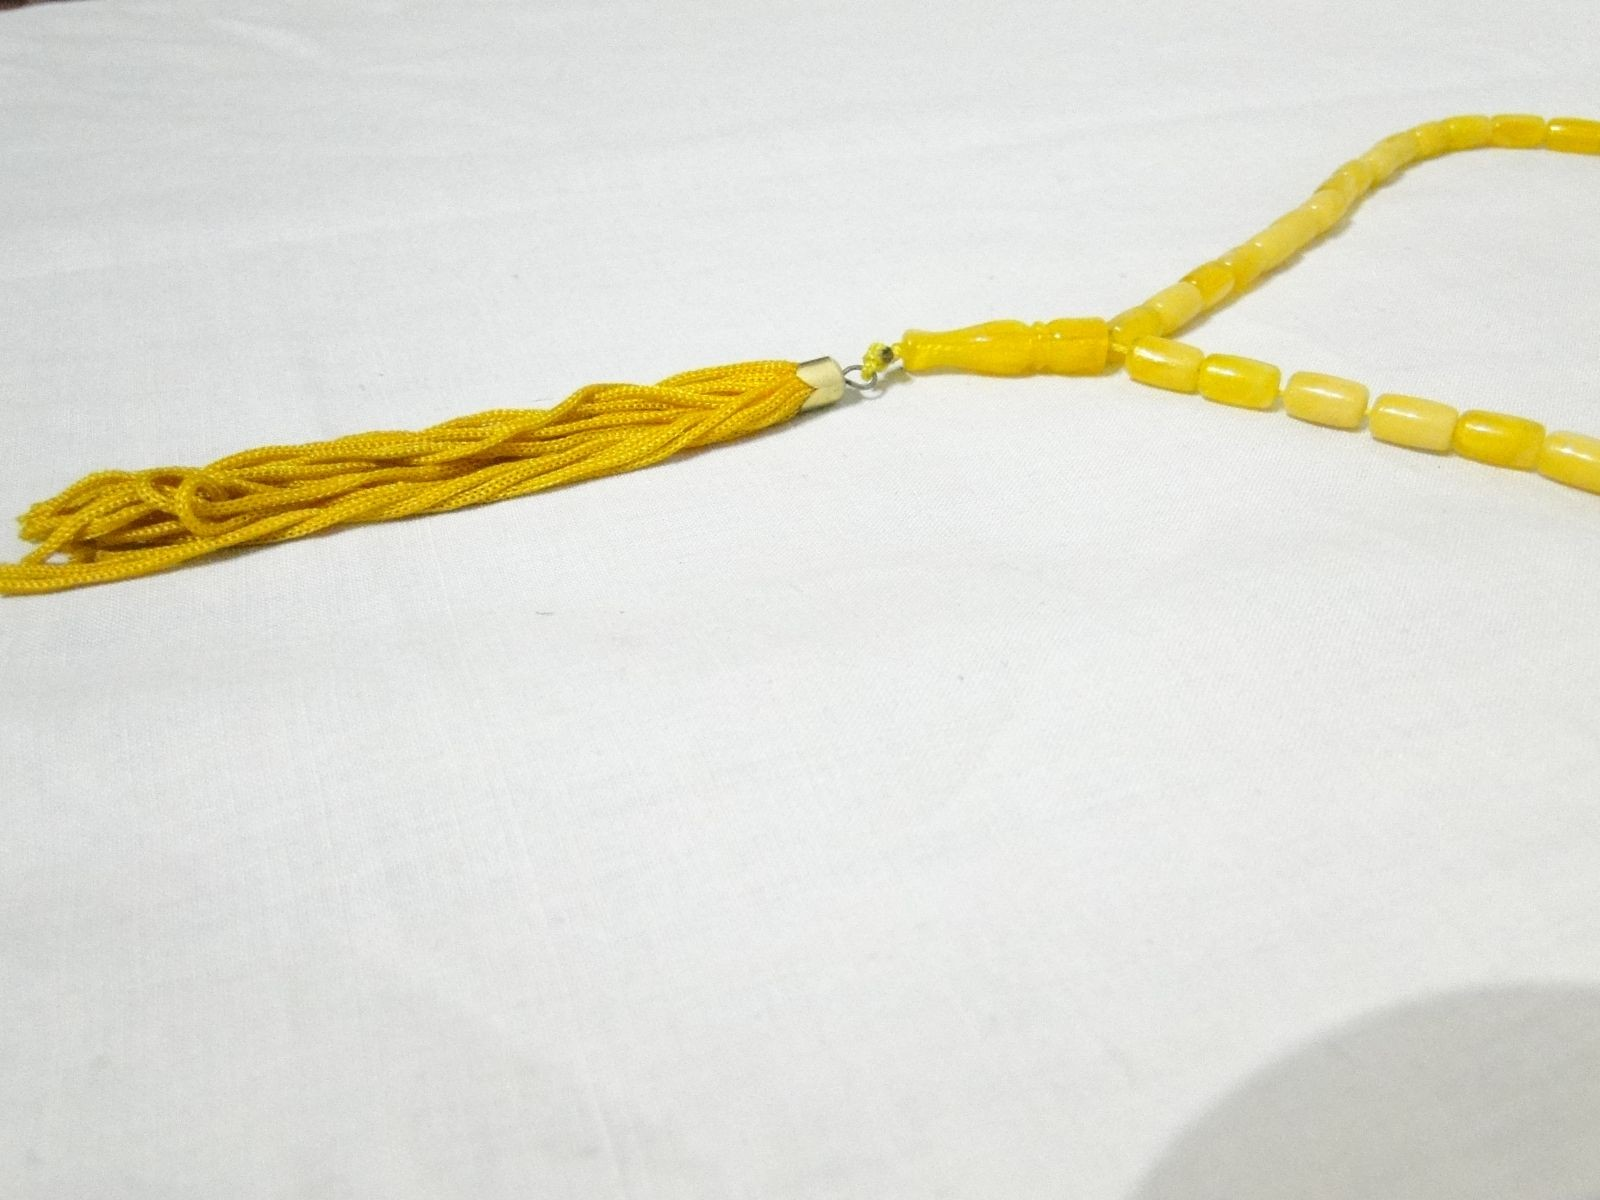 DSC02722.JPG (1600×1200)